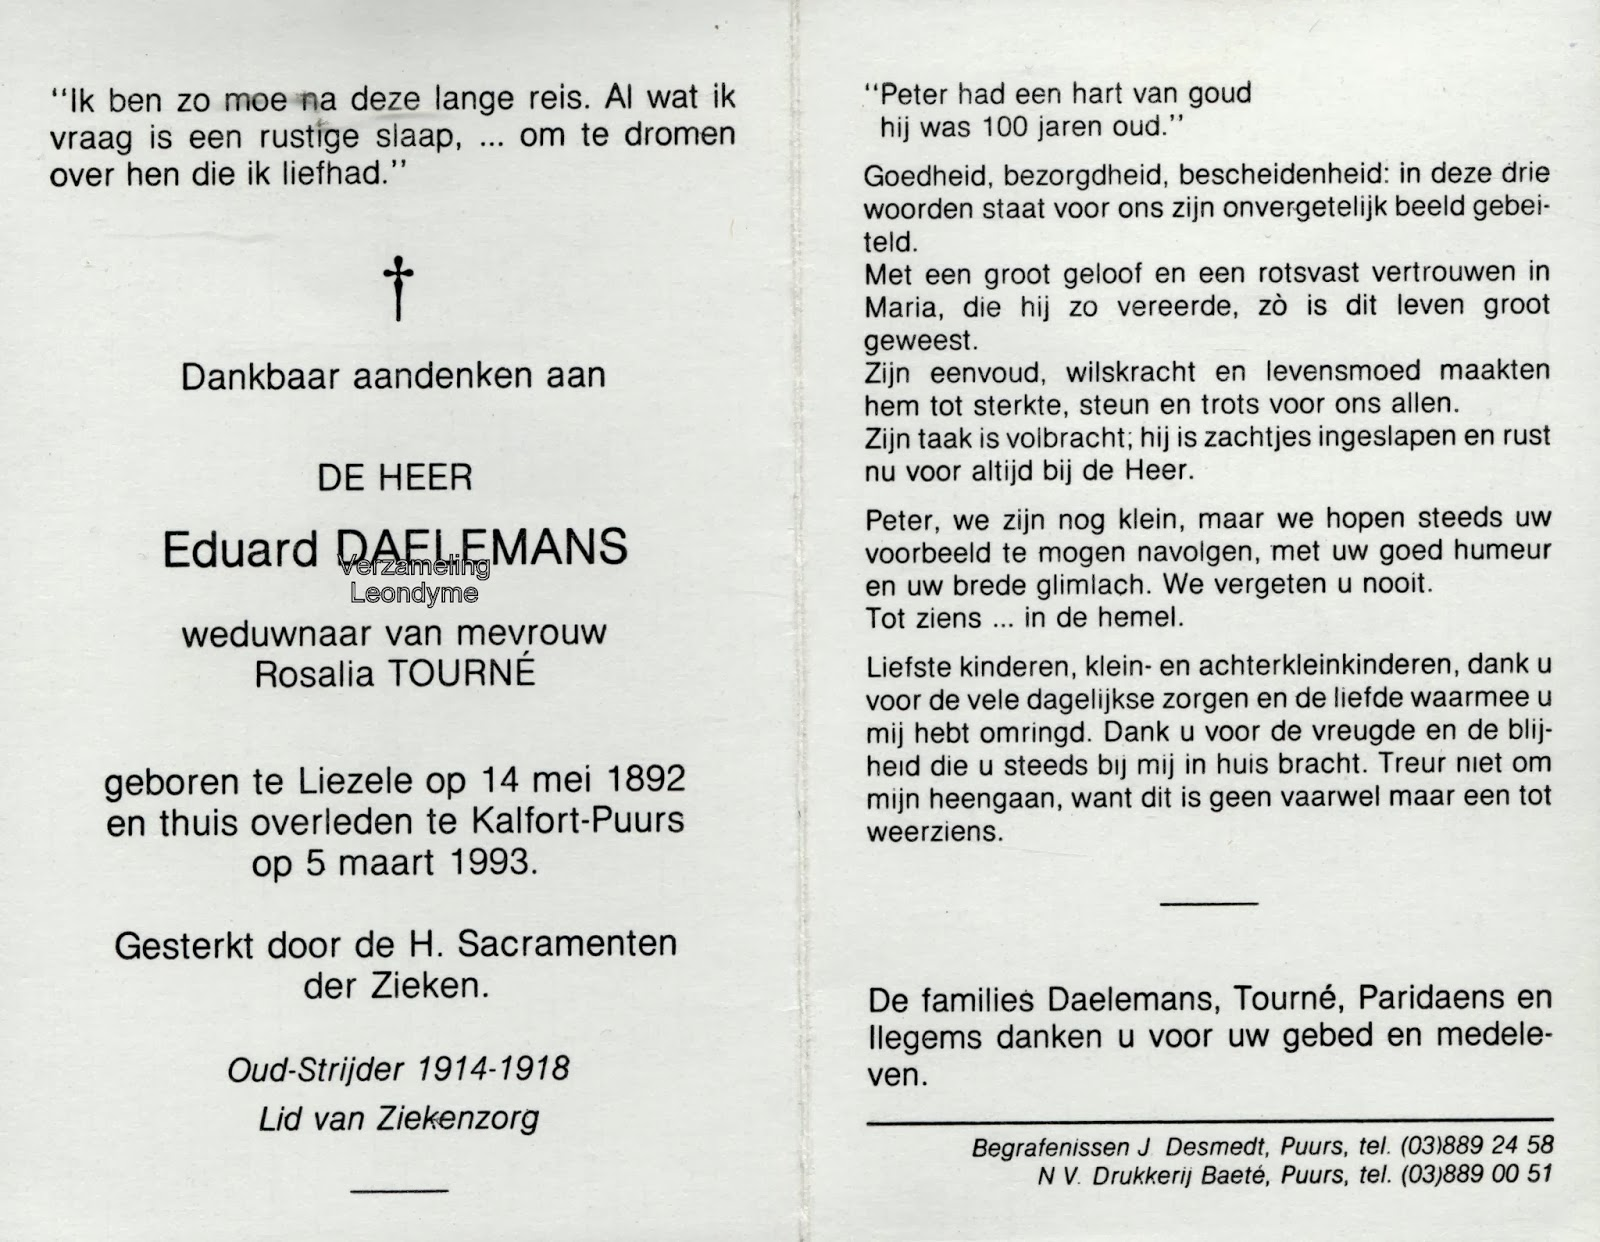 Bidprentje, Eduard Daelemans. Verzameling Leondyme.